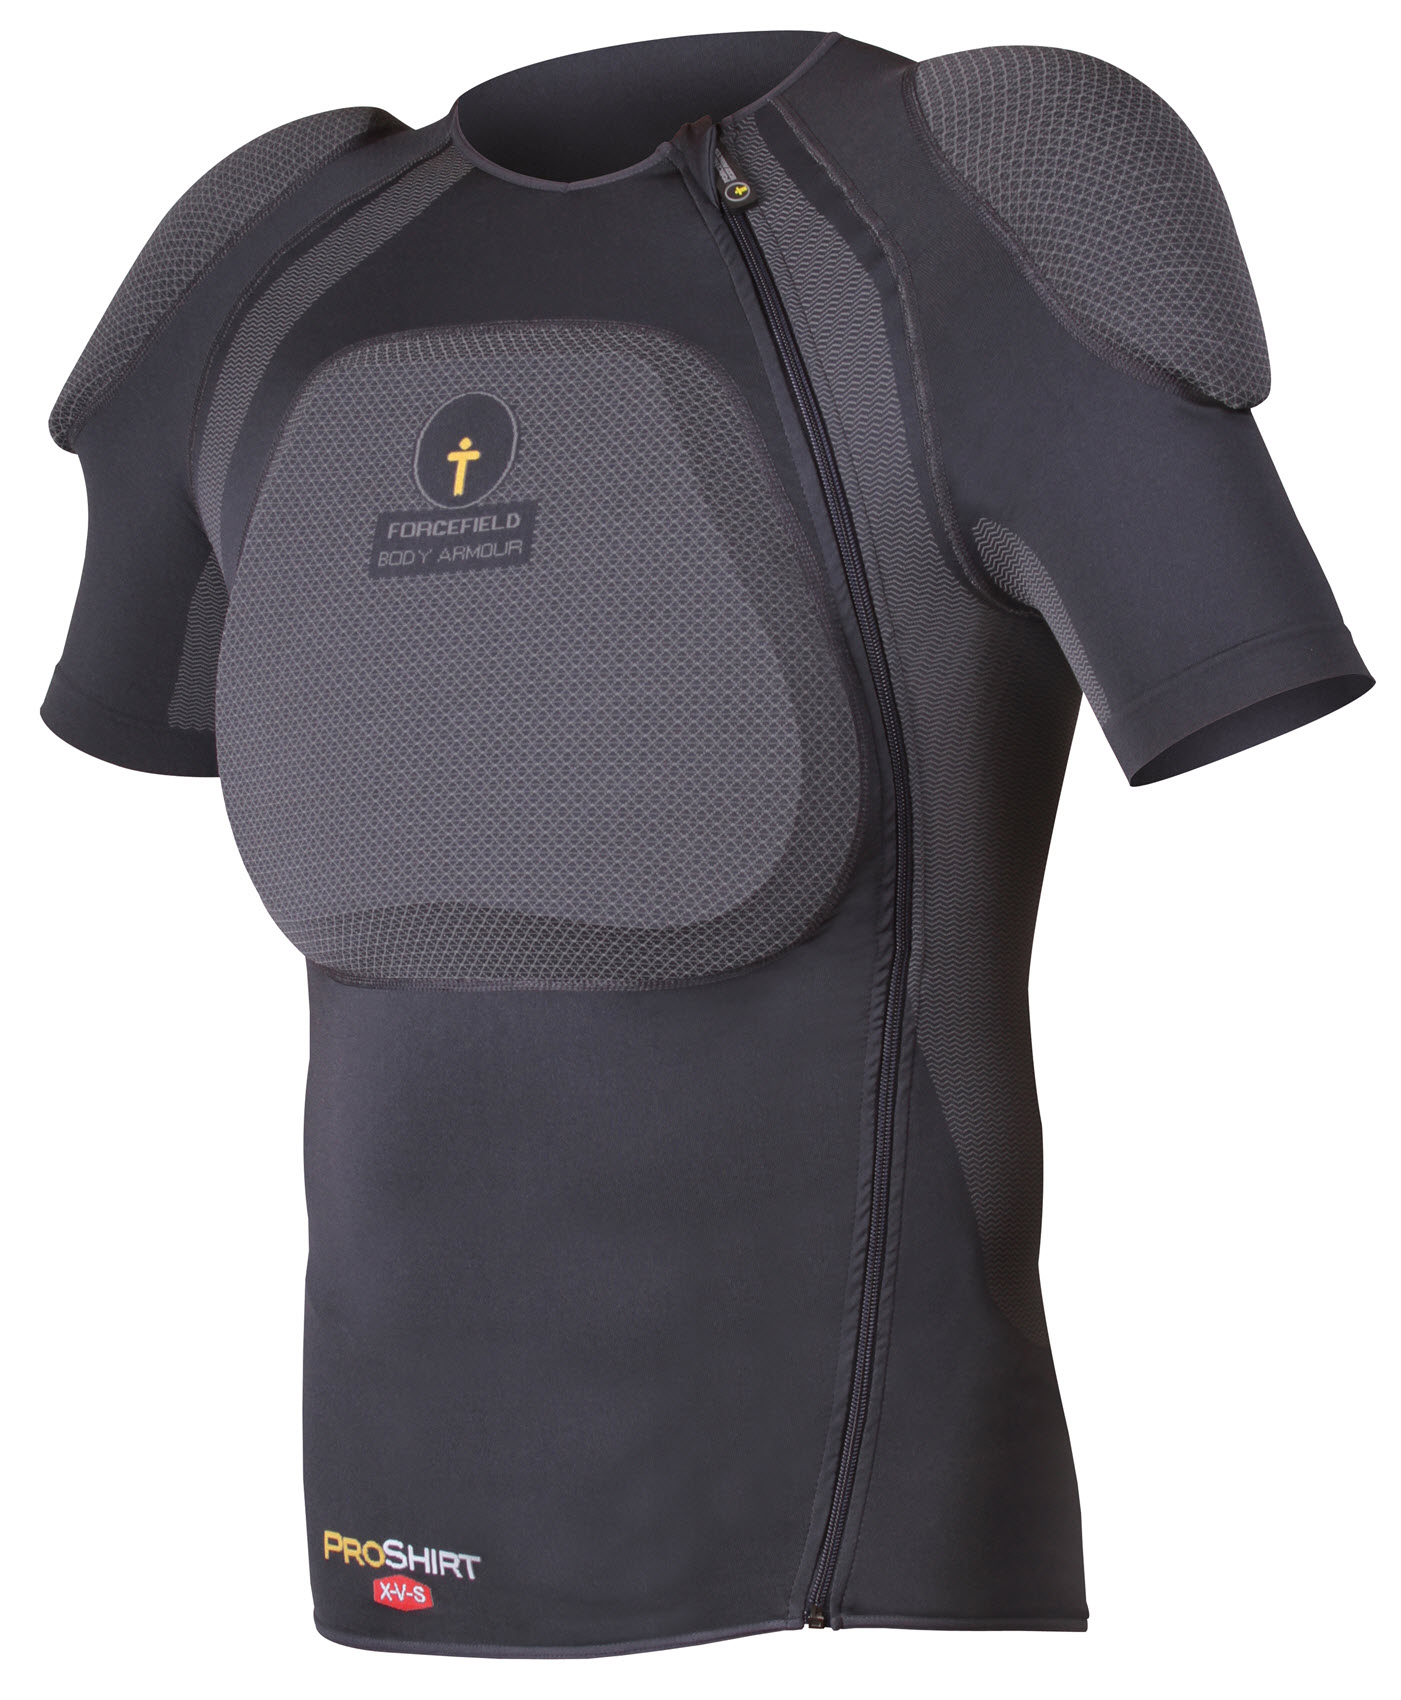 Forcefield-Body-Armour-Pro-Camisa-Snowboard-X-V-S-manga-corta-de-la-columna-vertebral-2017